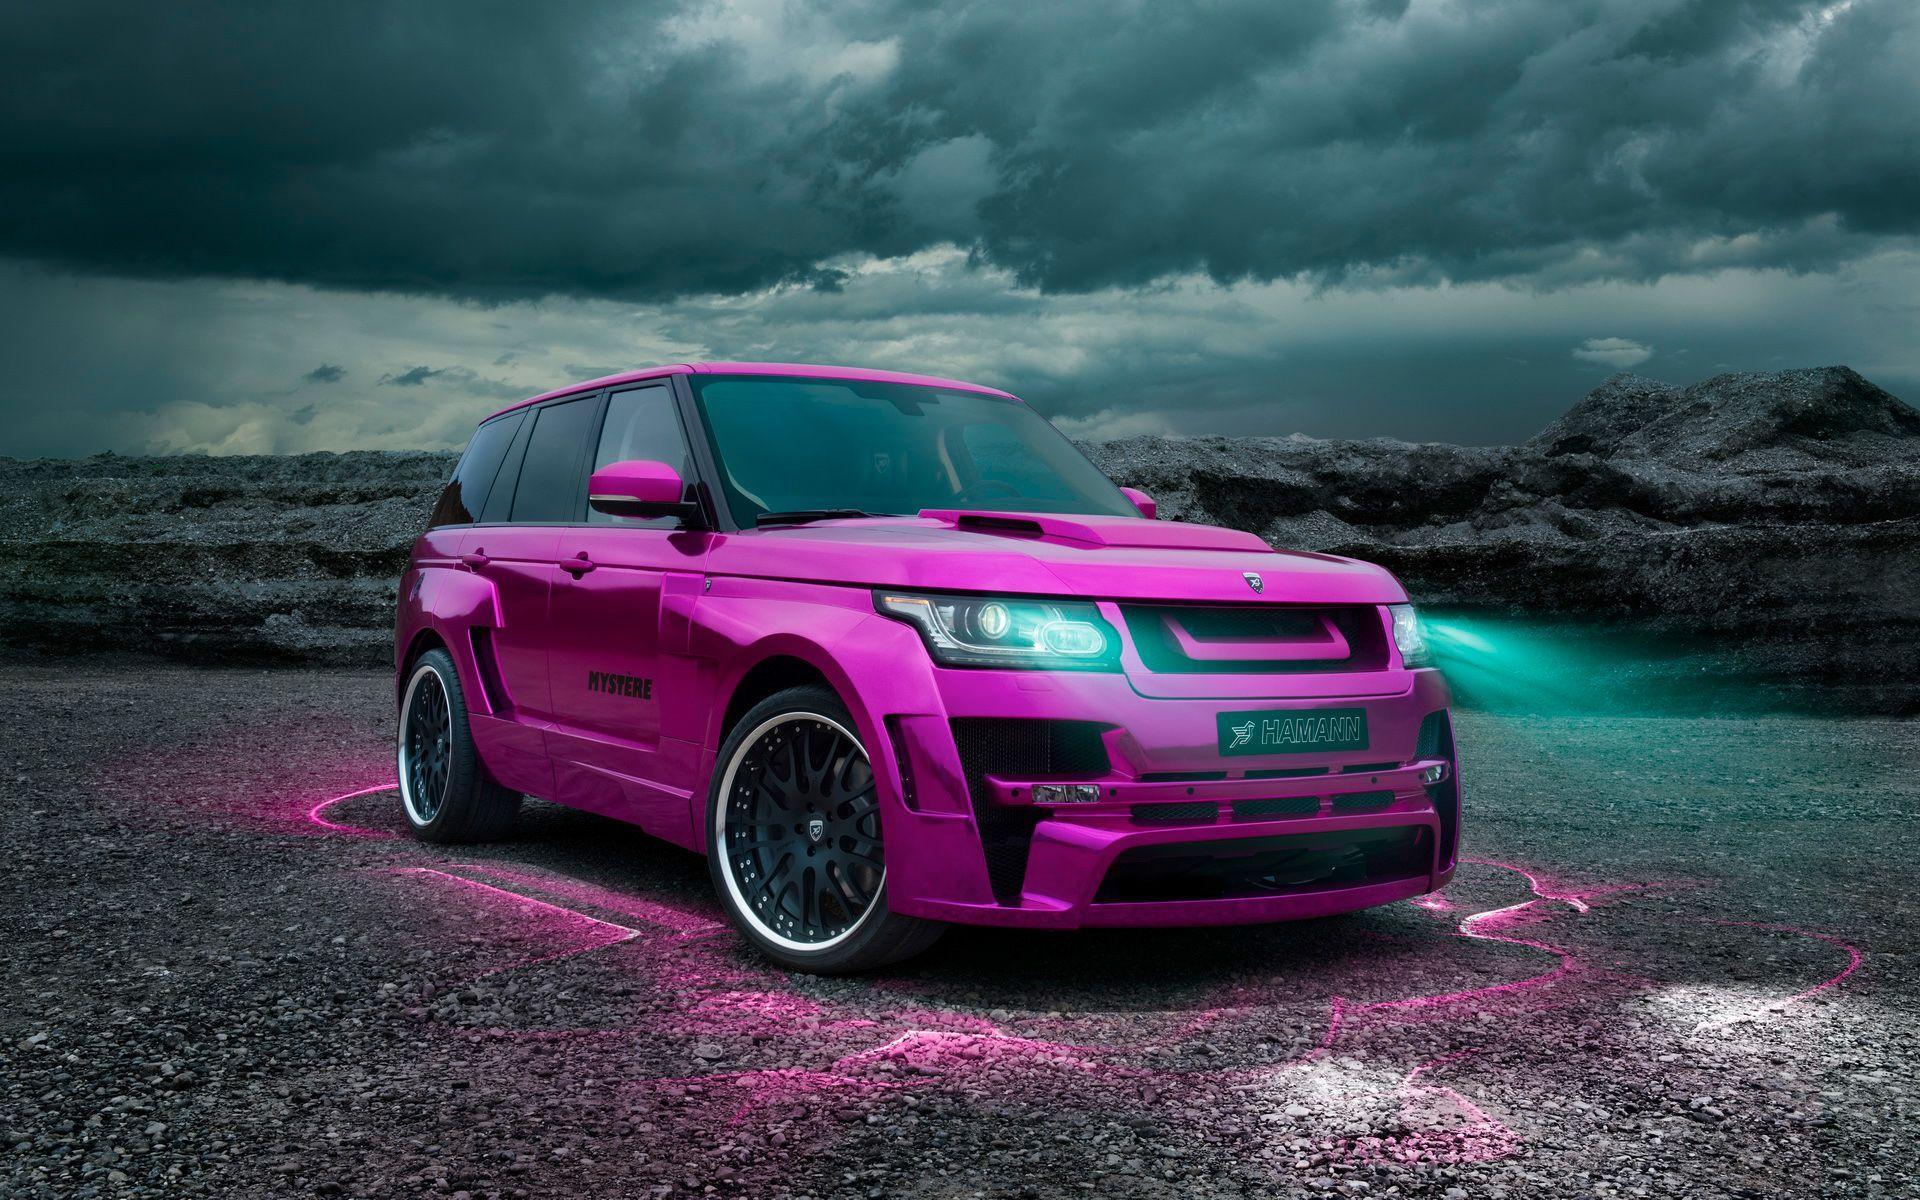 Pink Range Rover Modified Hd 1080p Wallpaper Background Weird Cars Range Rover Sport Range Rover